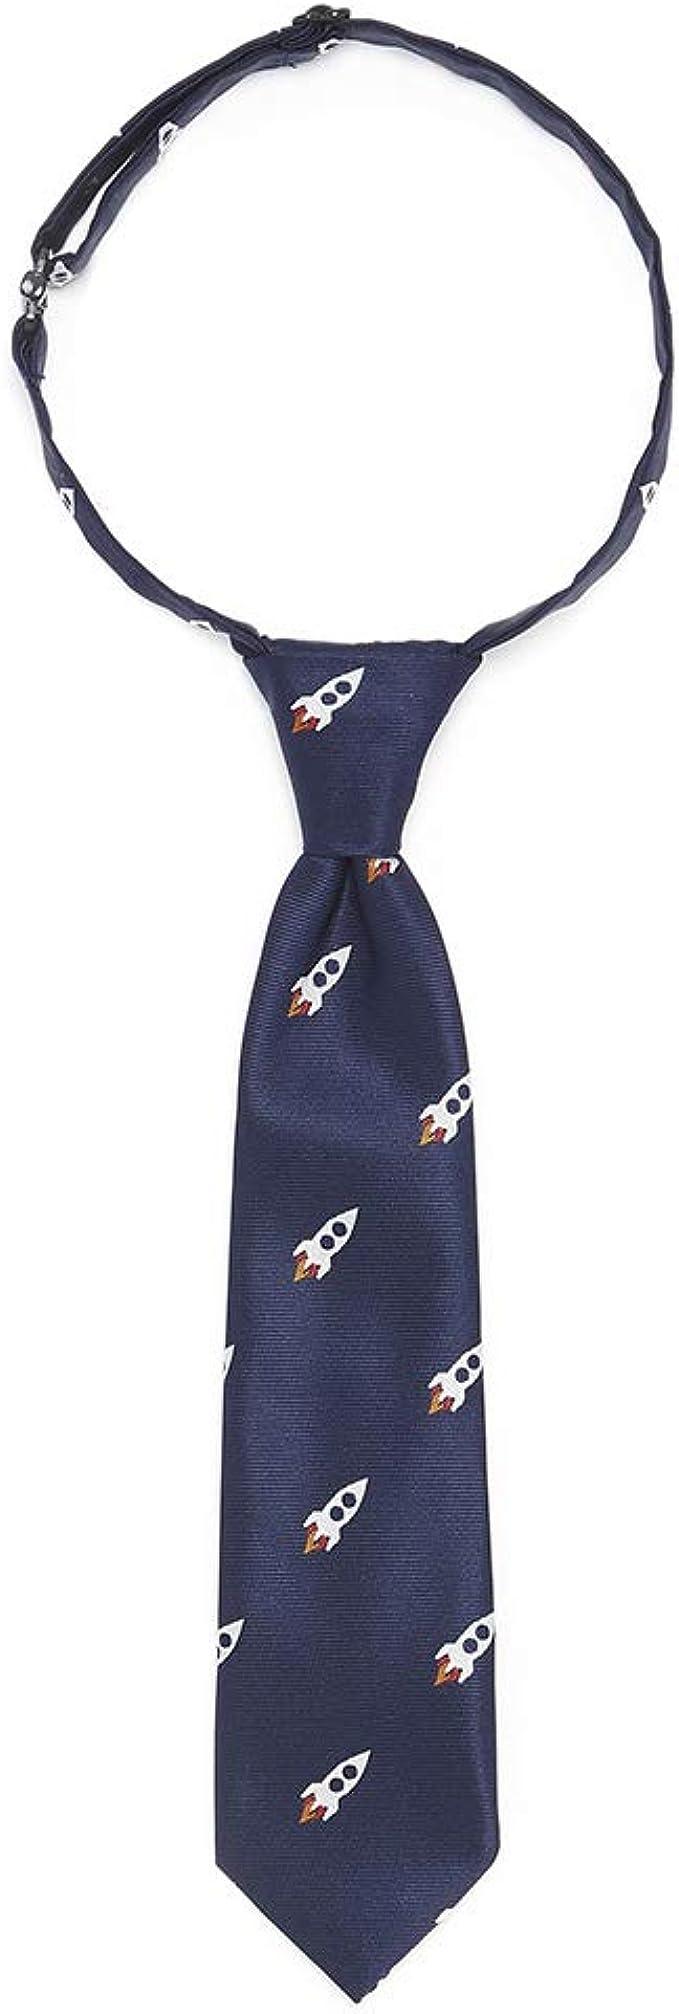 Lovjoy - Corbata - para niño Azul Navy Rocket Talla única: Amazon ...